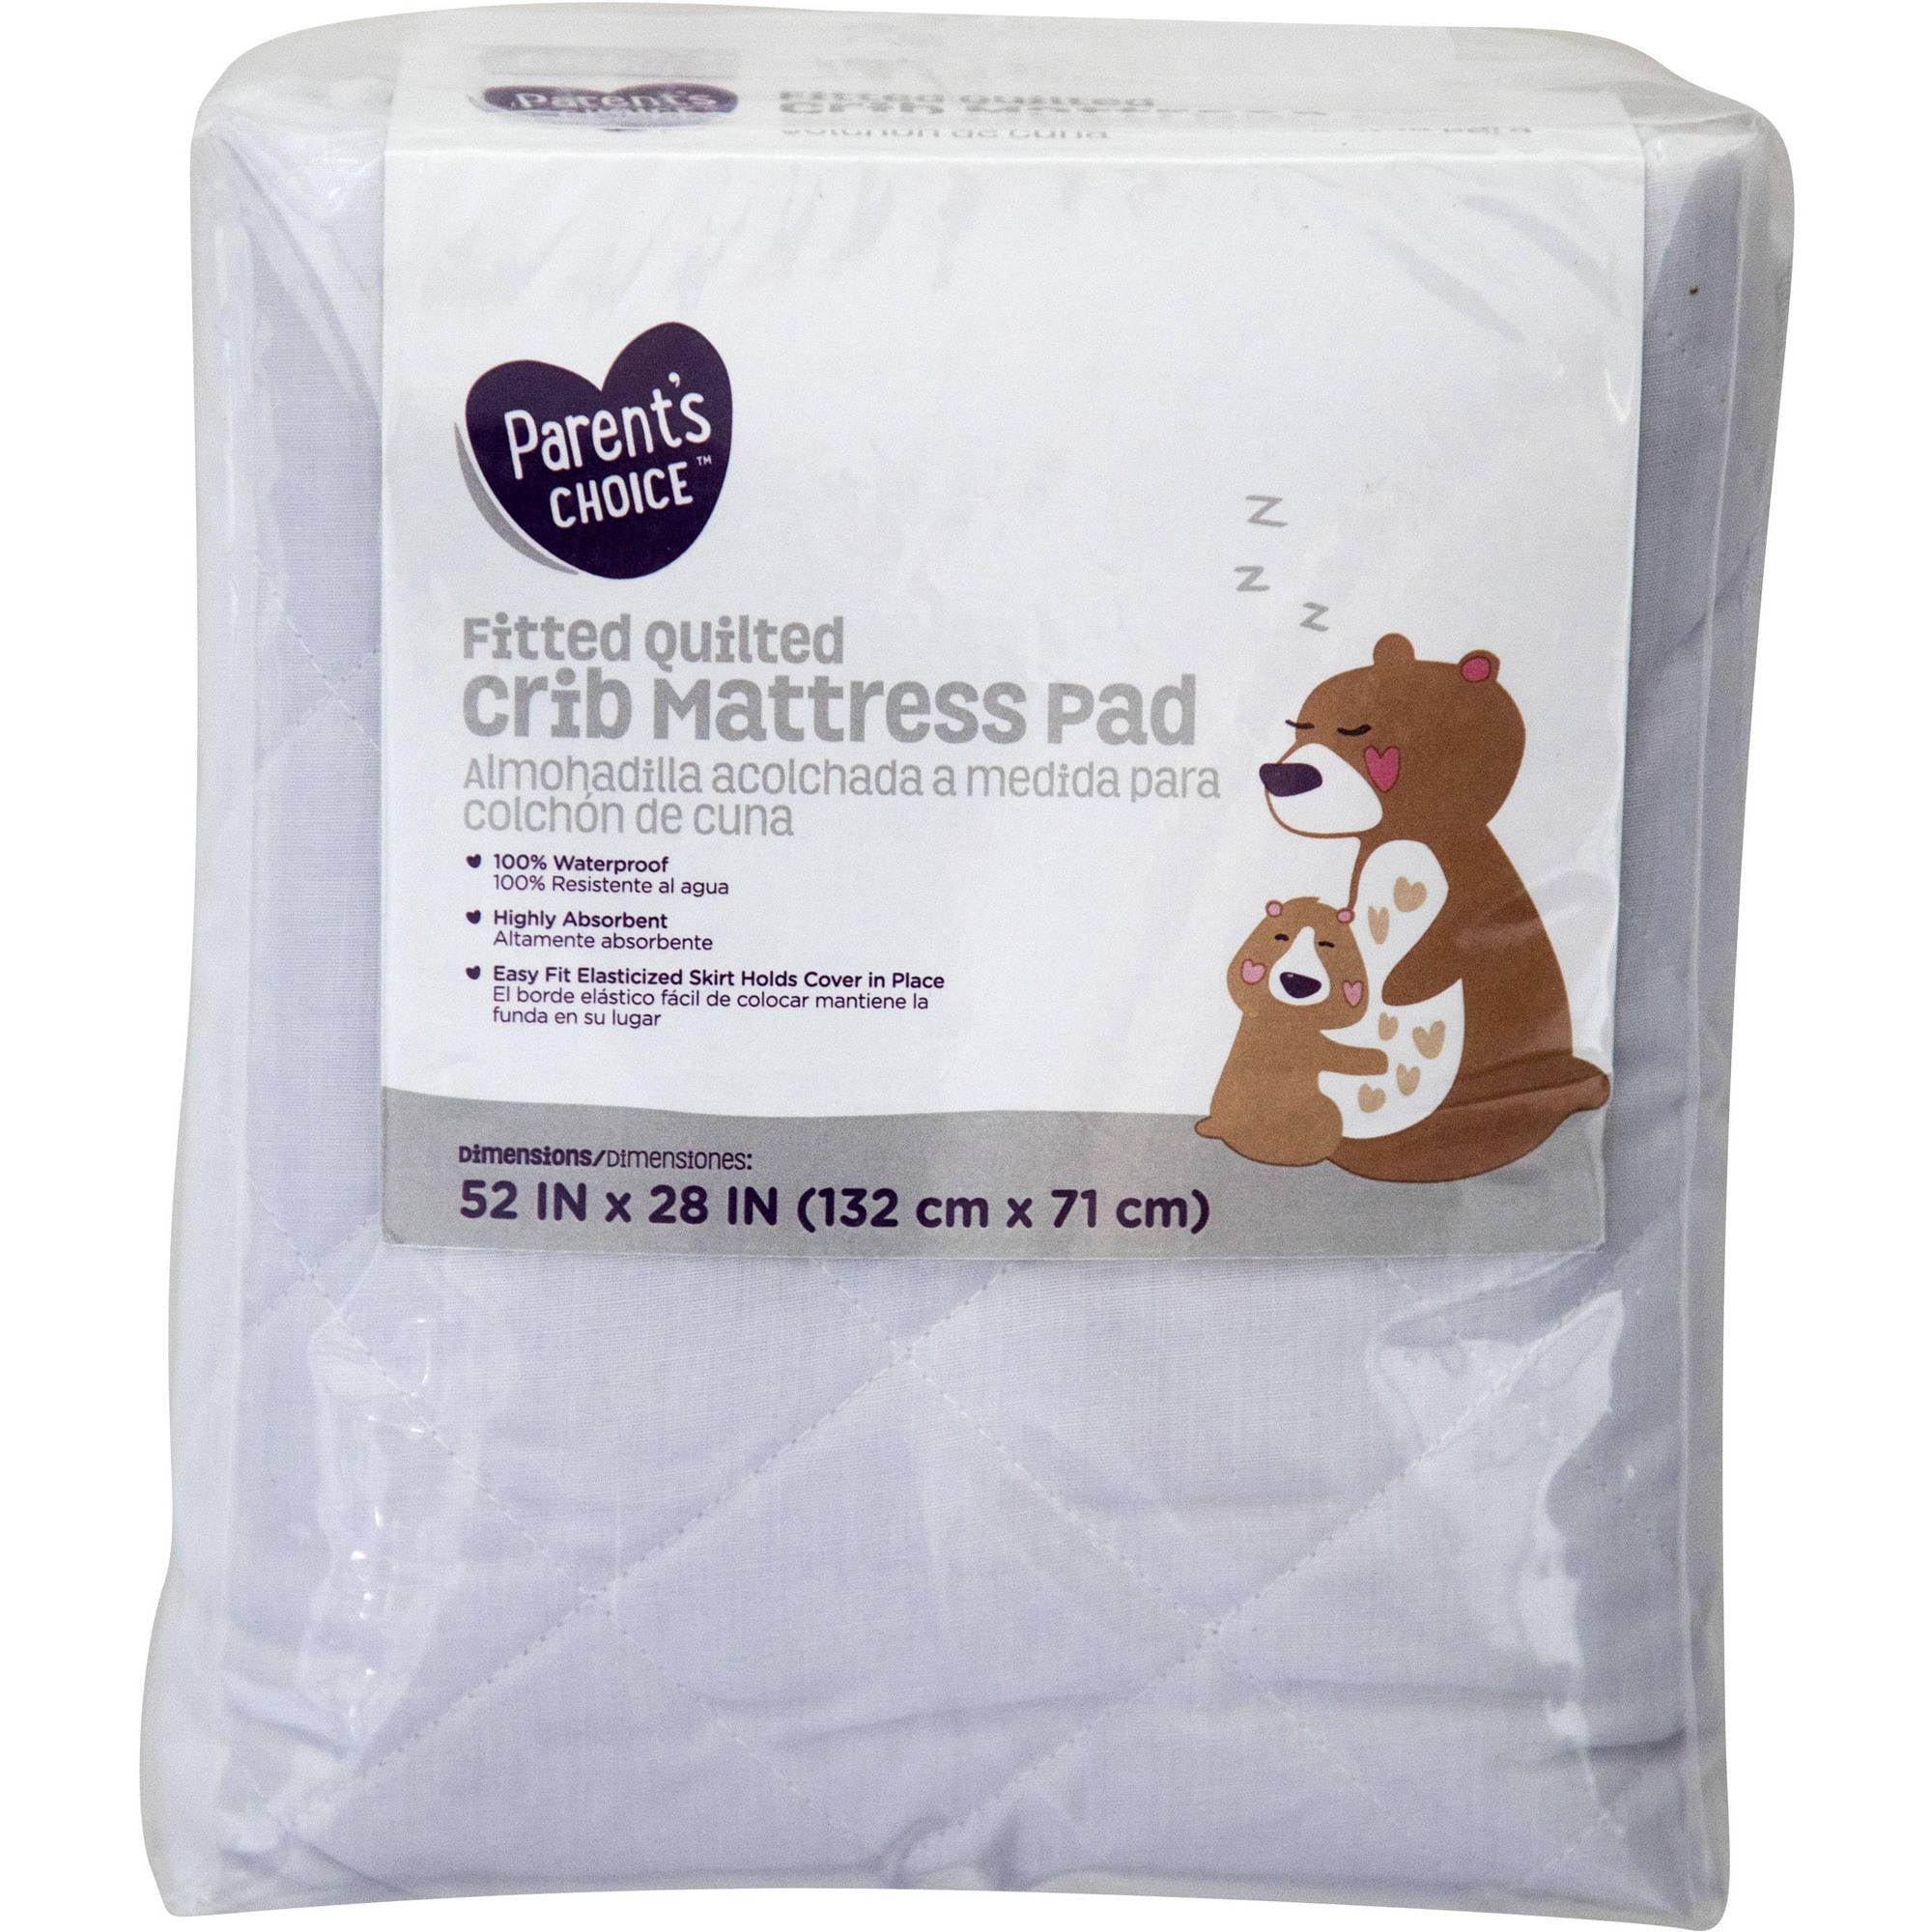 wid protector hei qlt zippered prod p spin infants pad summer crib mattress